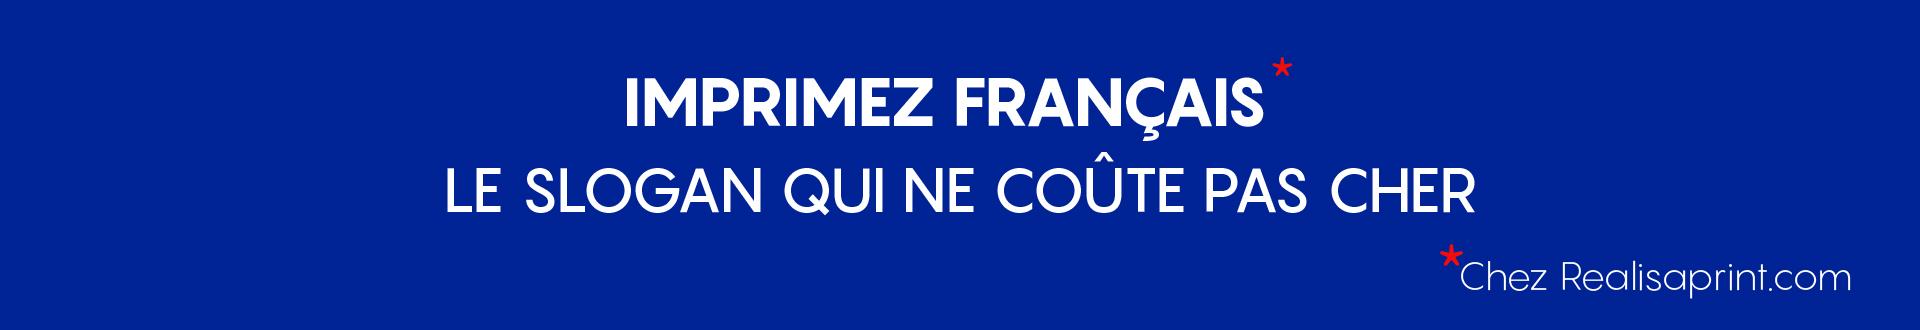 Imprimez Français